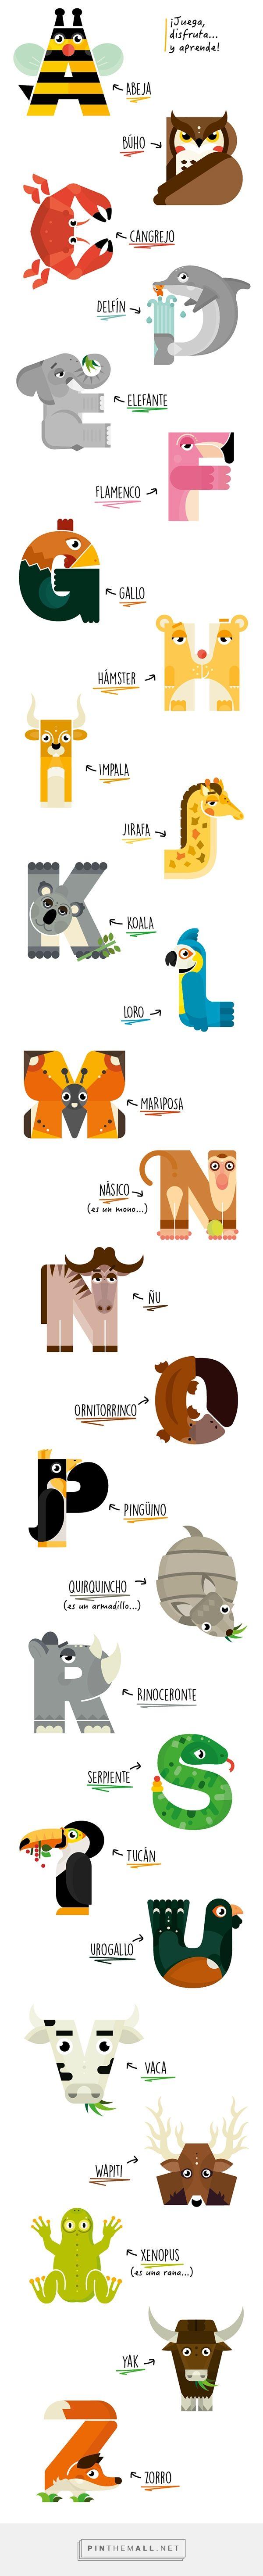 Animalario - Animal Alphabet | Fivestar Branding – Design and Branding Agency & Inspiration Gallery